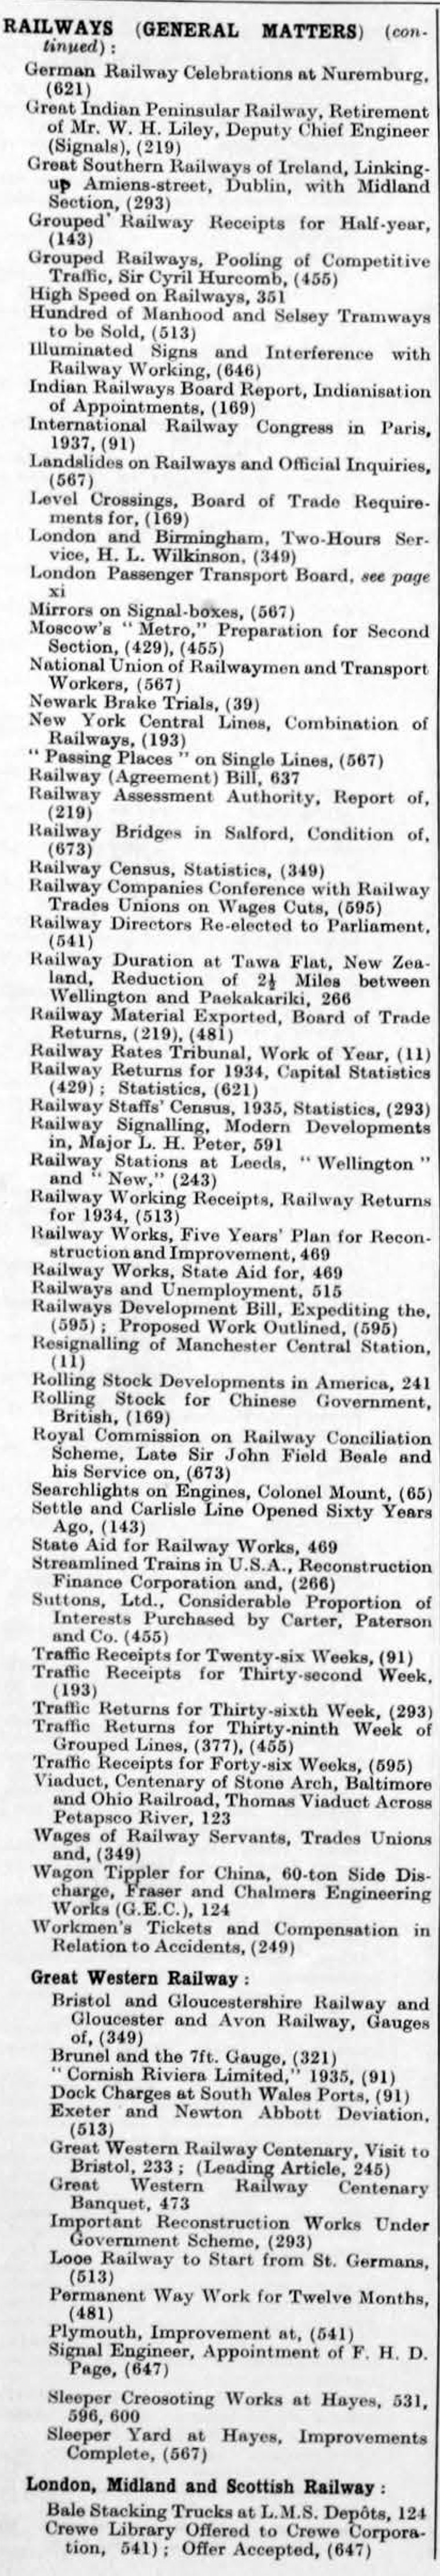 The Engineer 1935 Jul-Dec: Index - Graces Guide